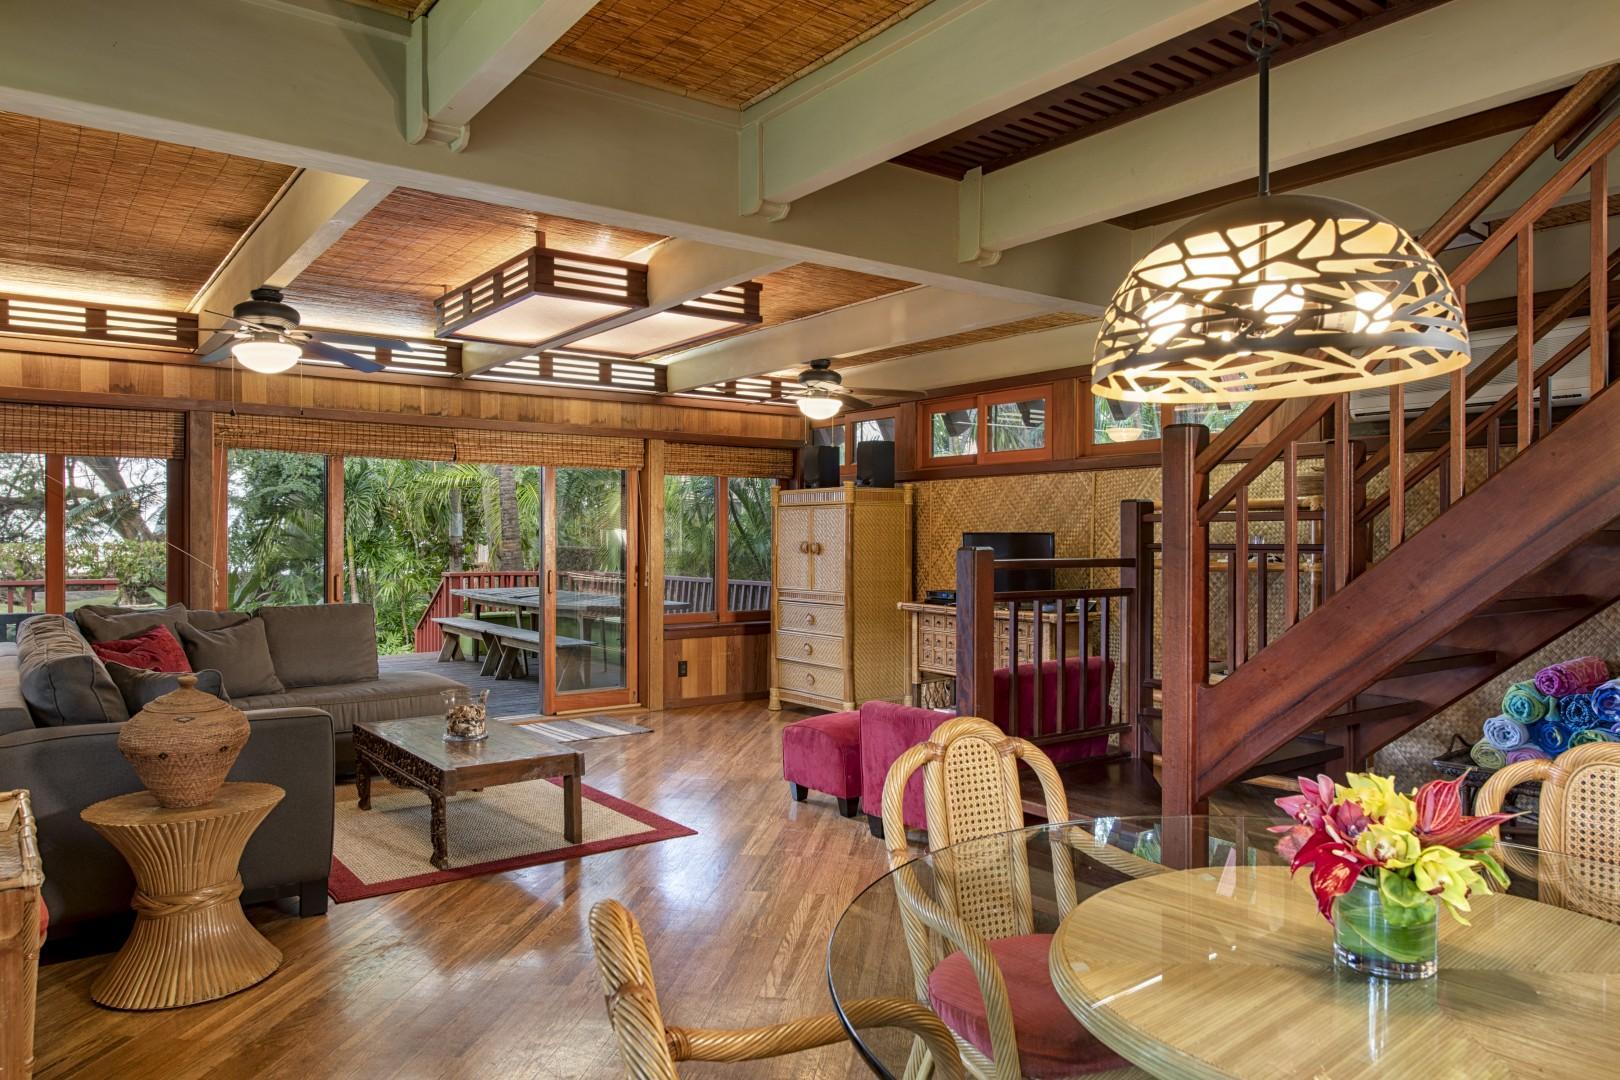 7. Spacious Living Room